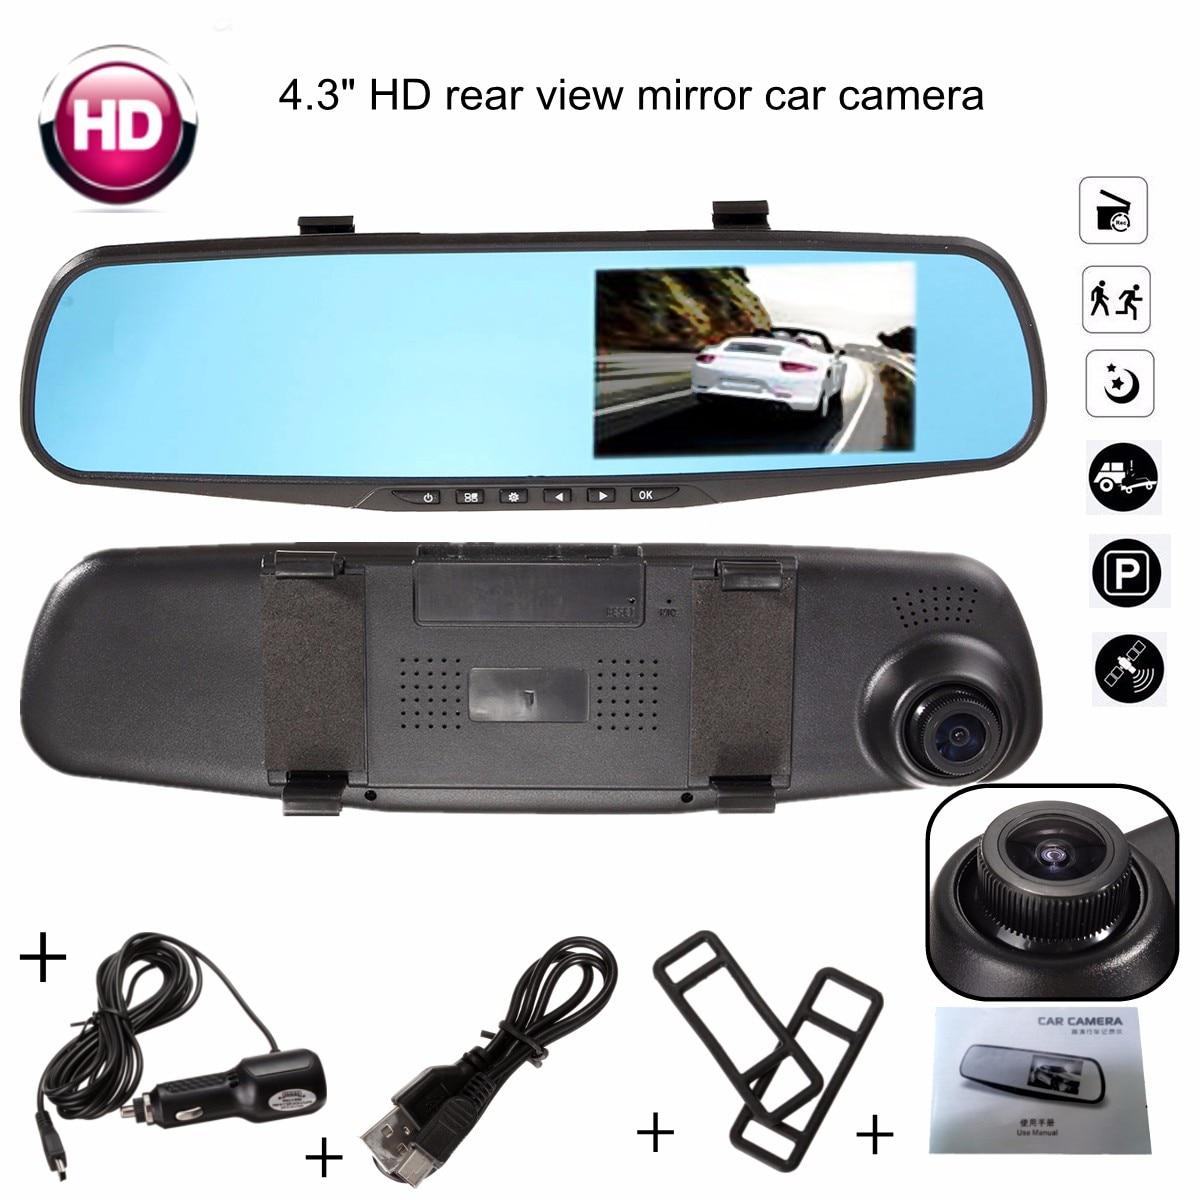 4.3 Inch FHD 1080P Video Recorder Dash Cam Rearview Mirror Car Camera DVR Digital Video Recorder 170 Degree